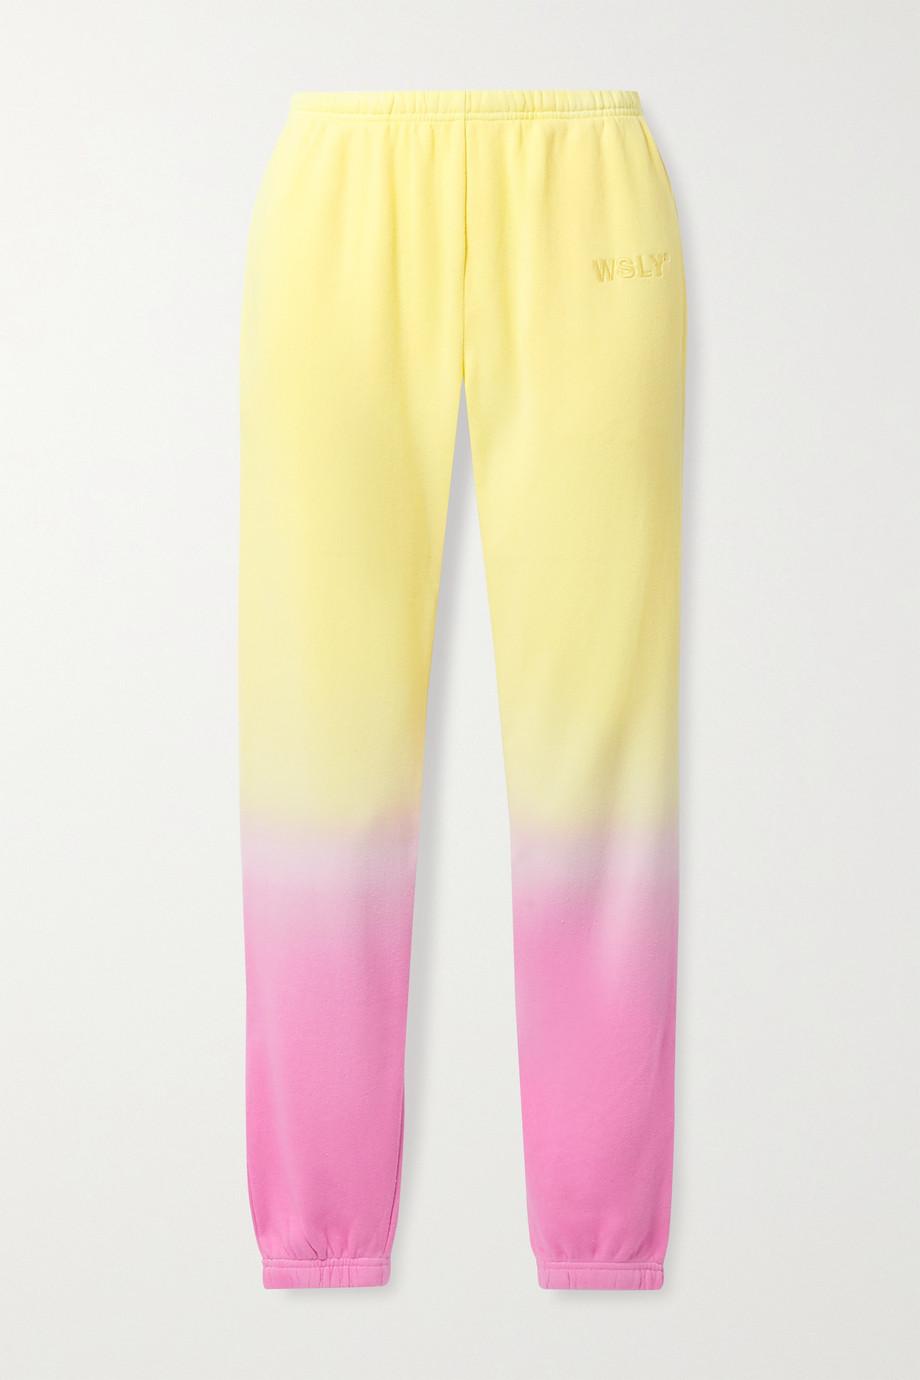 WSLY Ombré cotton-blend jersey track pants